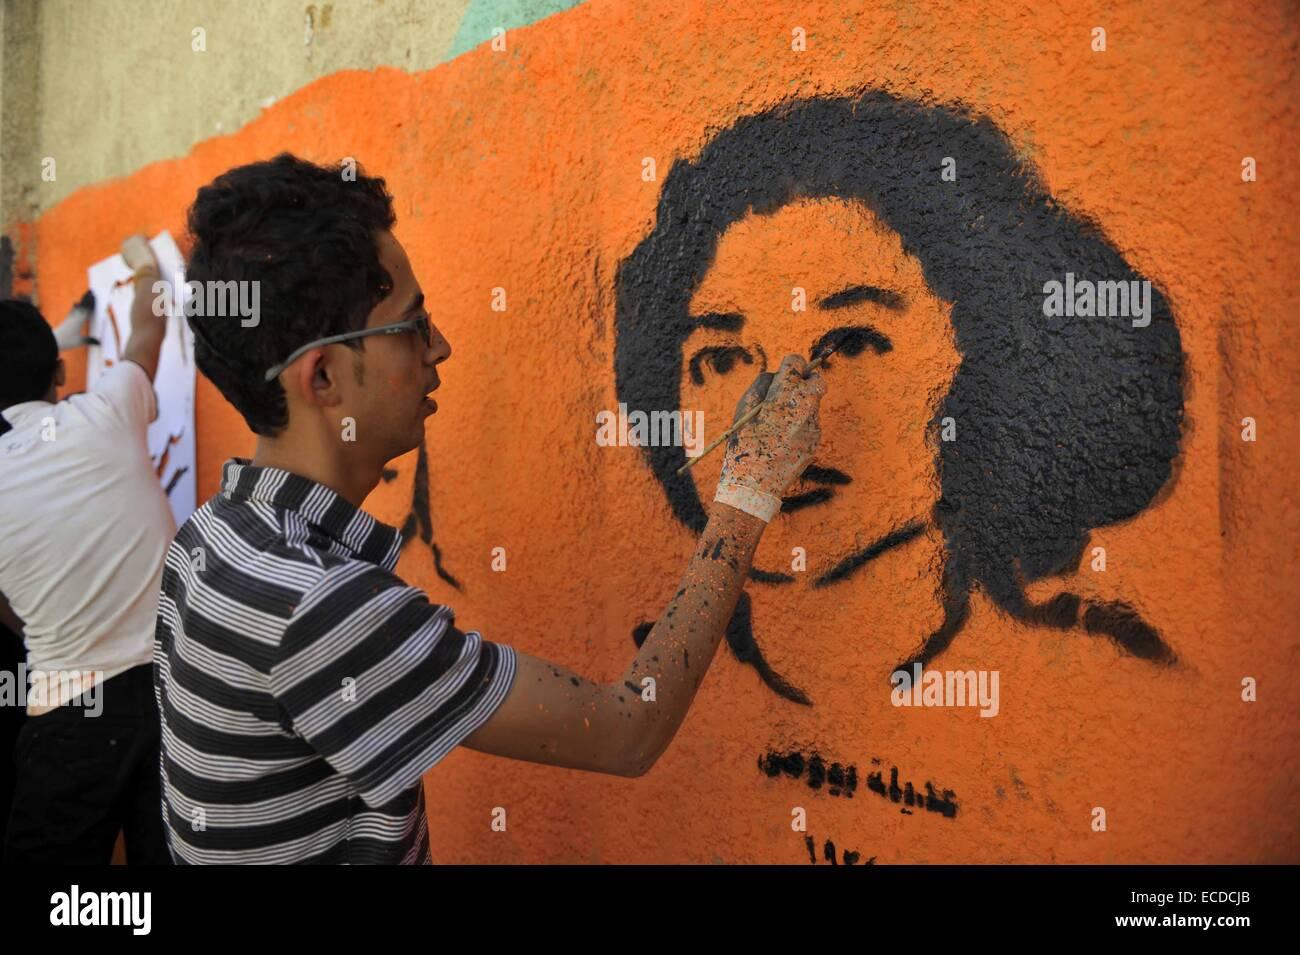 Sanaa. 11th Dec, 2014. A Yemeni activist draws graffiti on a wall in a street in Sanaa, Yemen, on Dec. 11, 2014, - Stock Image